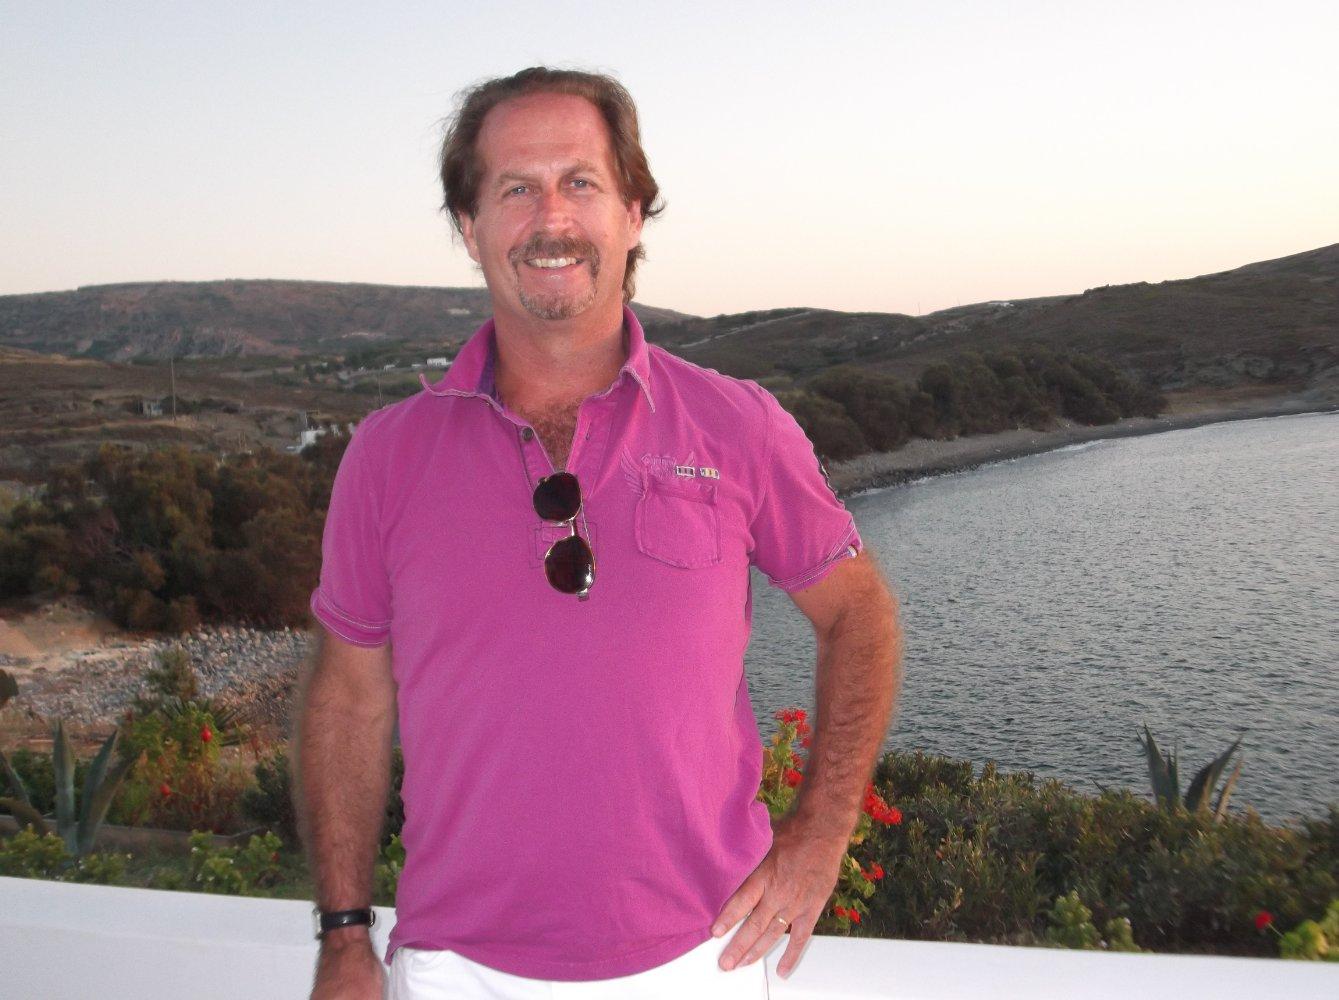 Kevin Kaufman